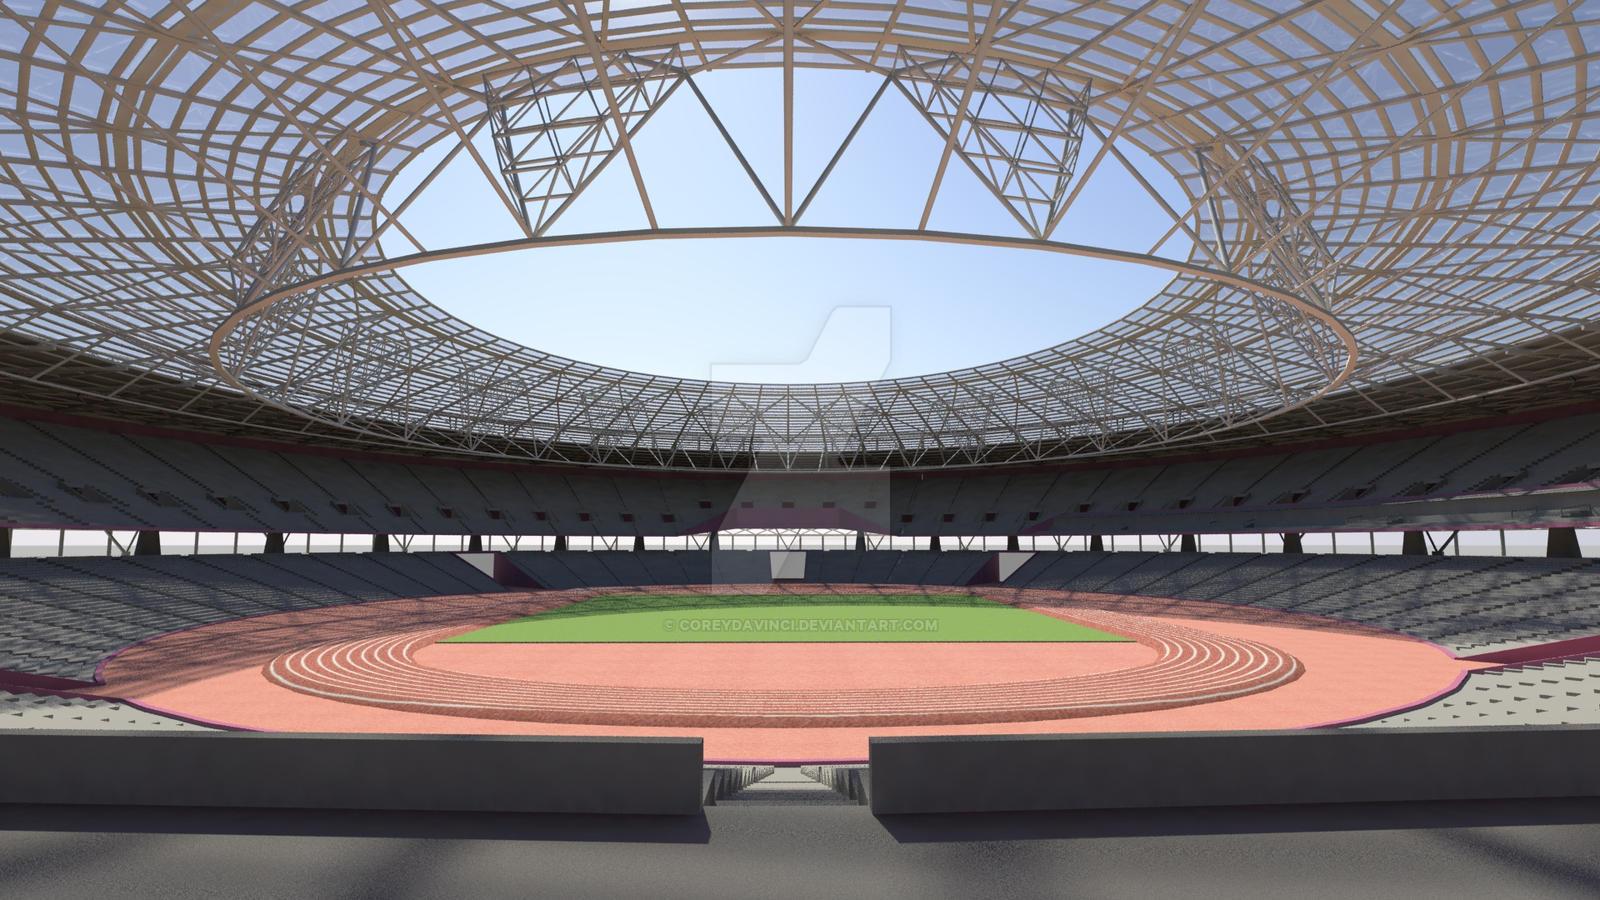 West Ham Olympic Stadium By CoreyDaVinci On DeviantArt